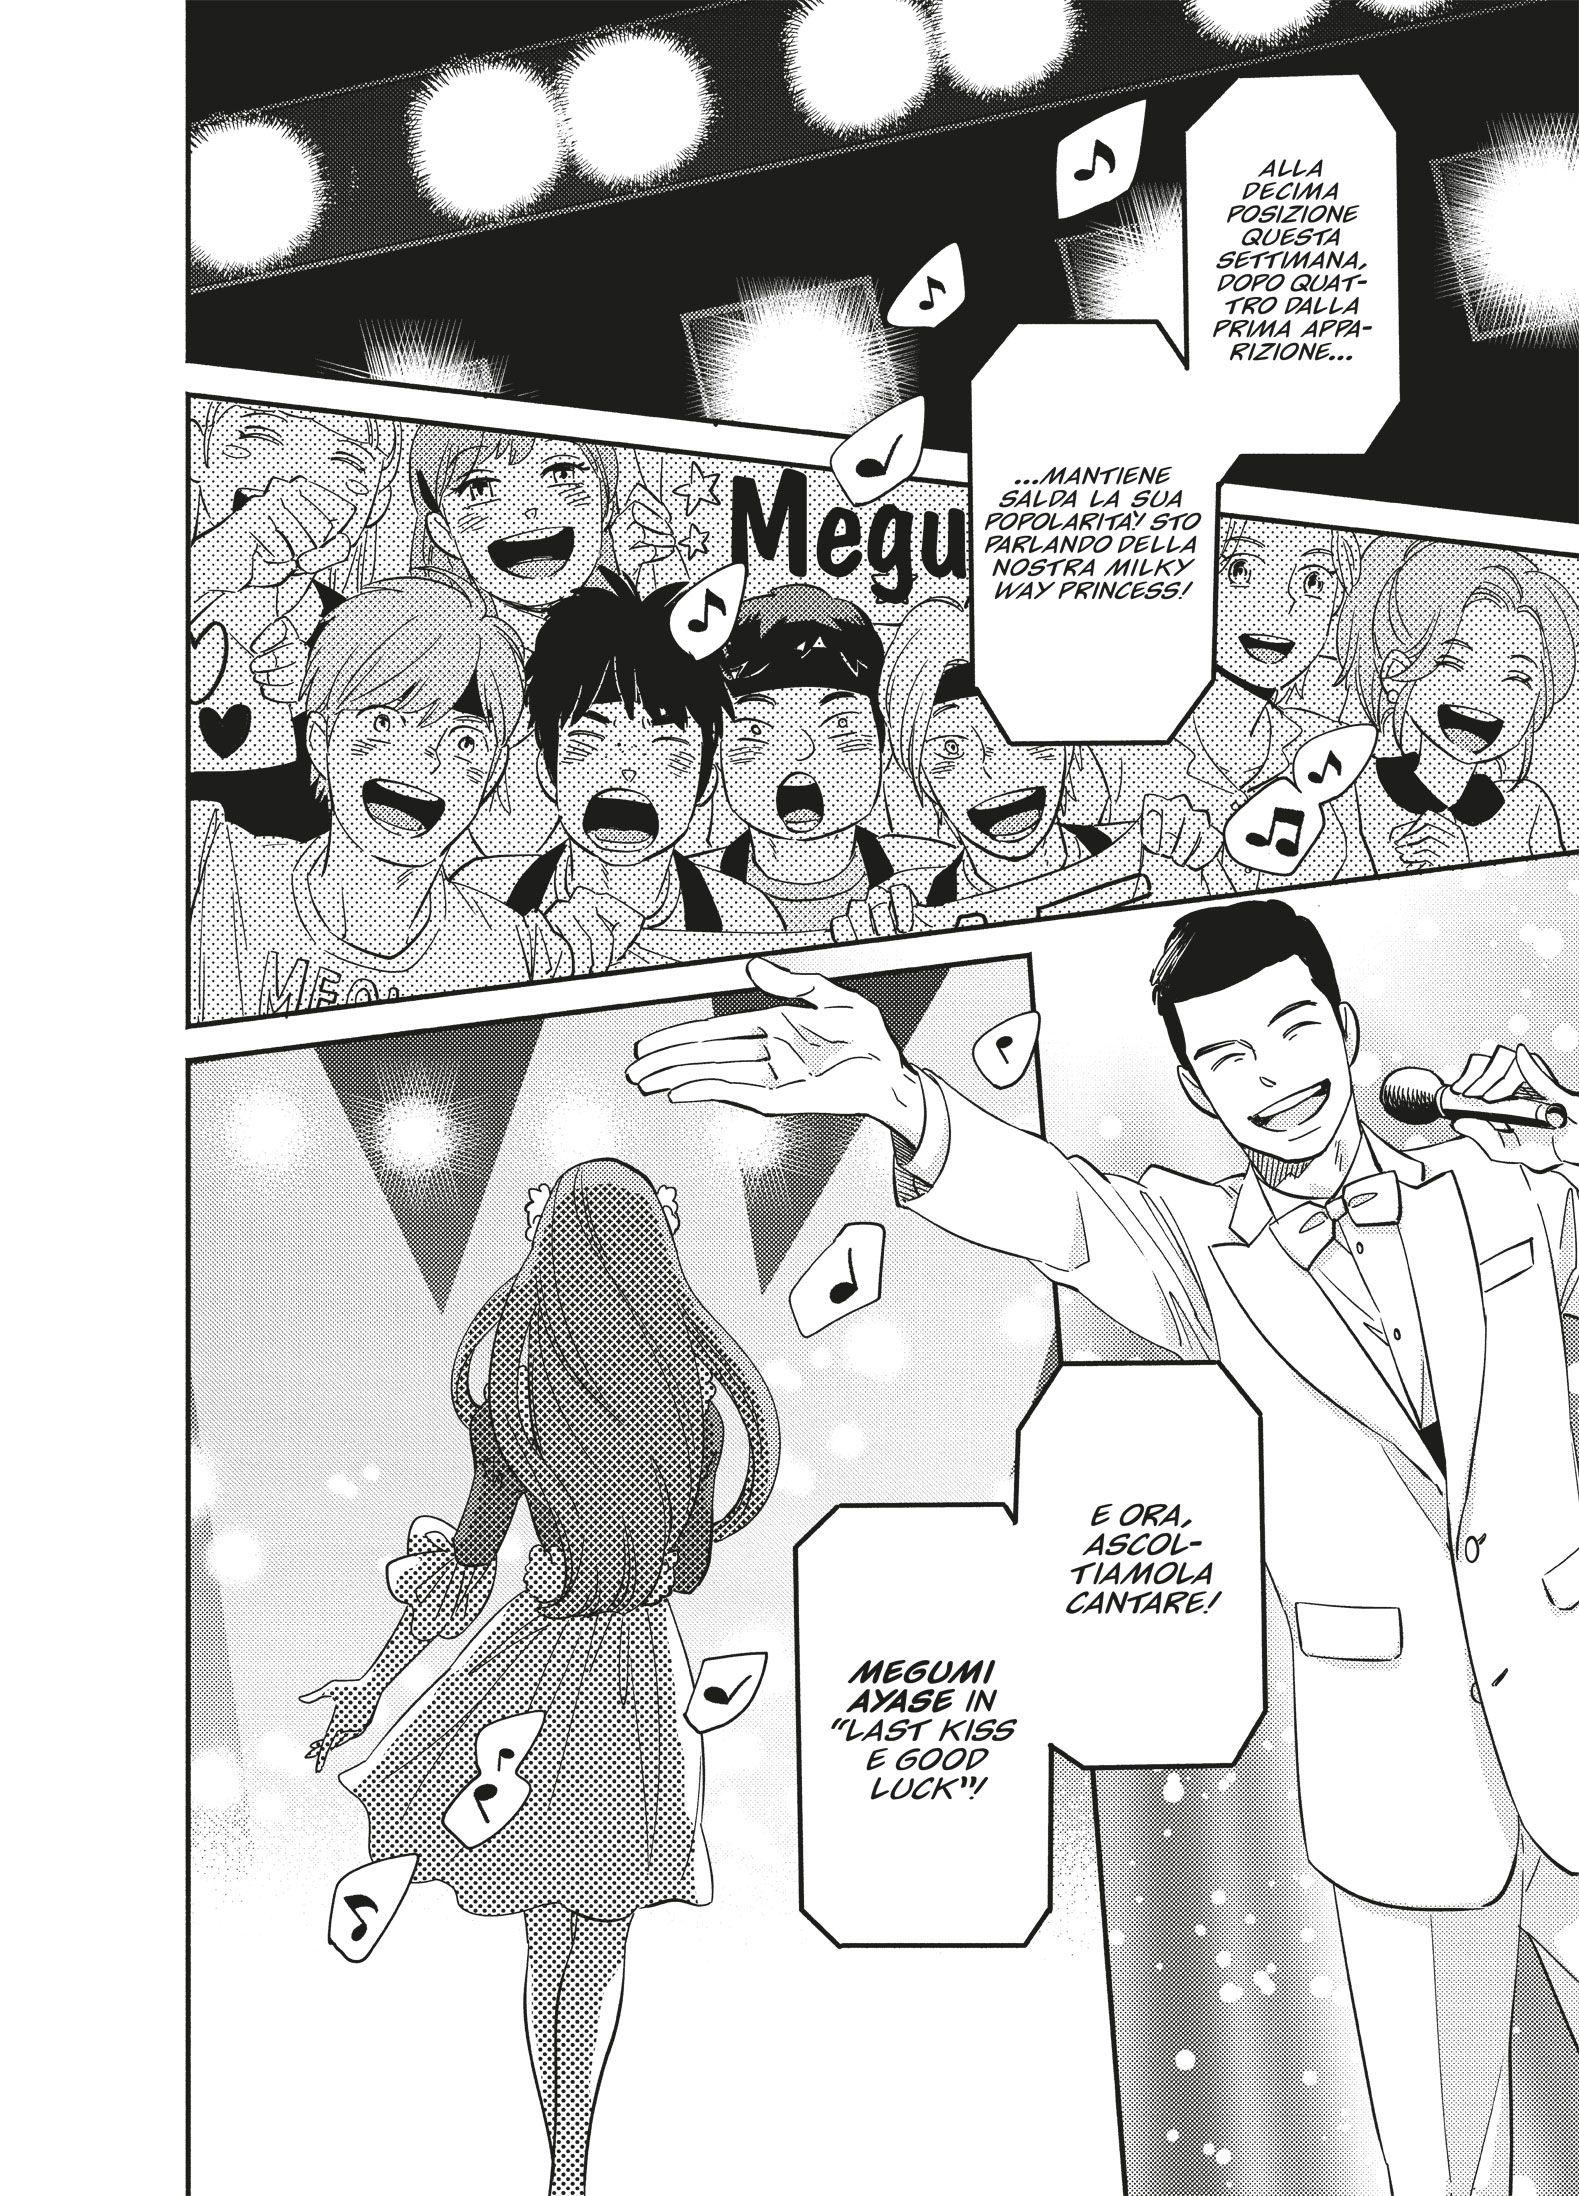 CREAMY MAMI IDOL PACK - Recensione del manga pack di Star Comics